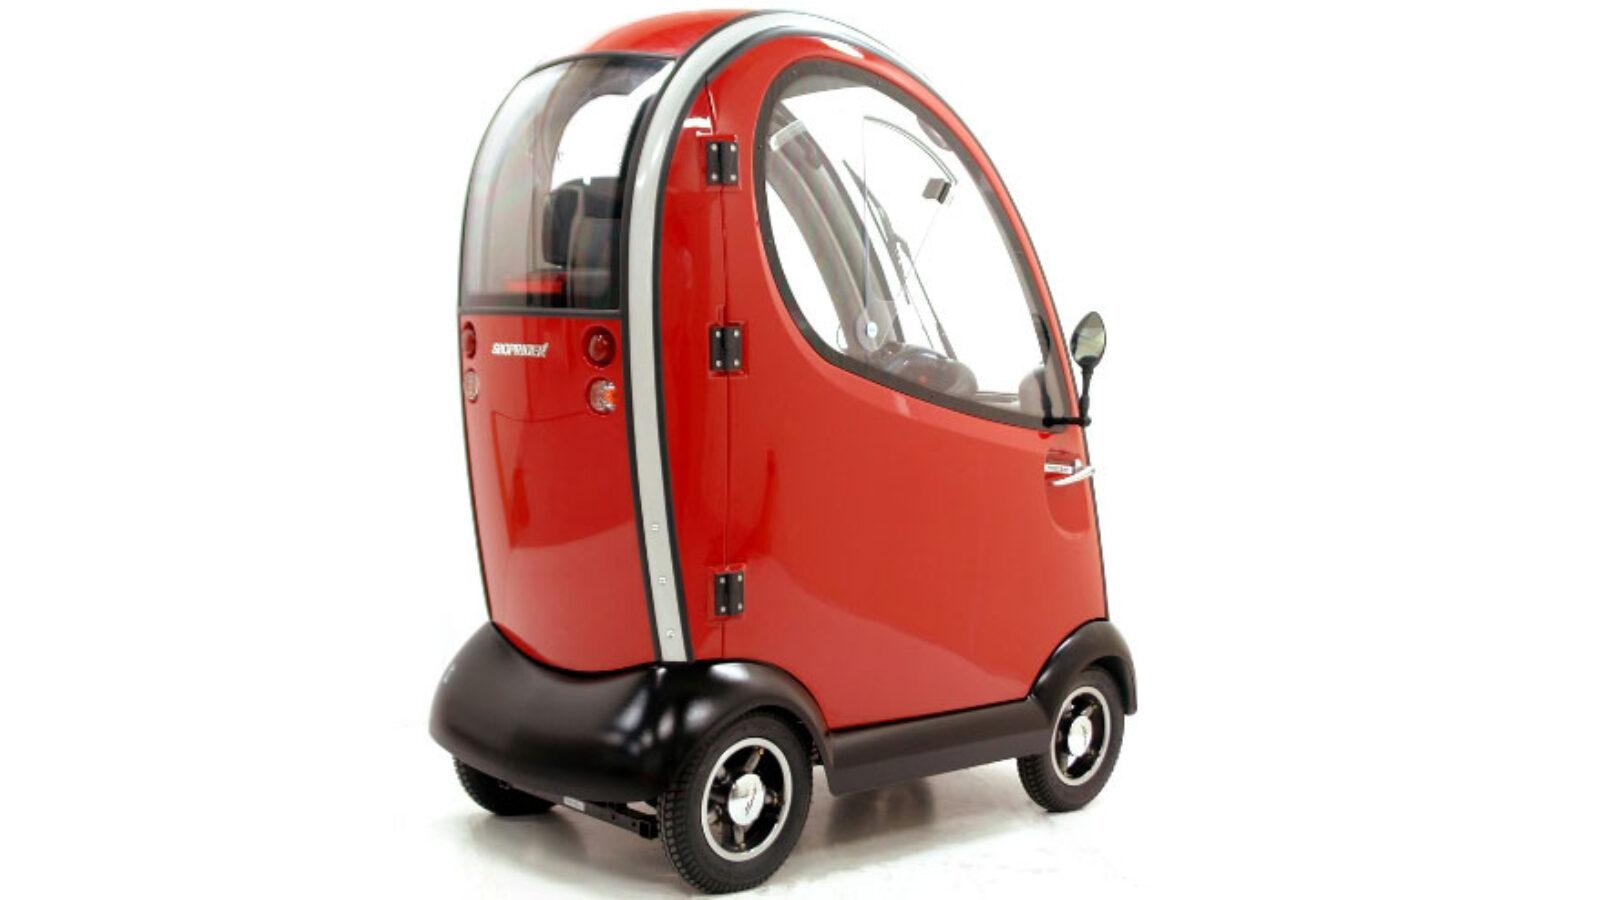 elektromobil-liebke-em-p700-2